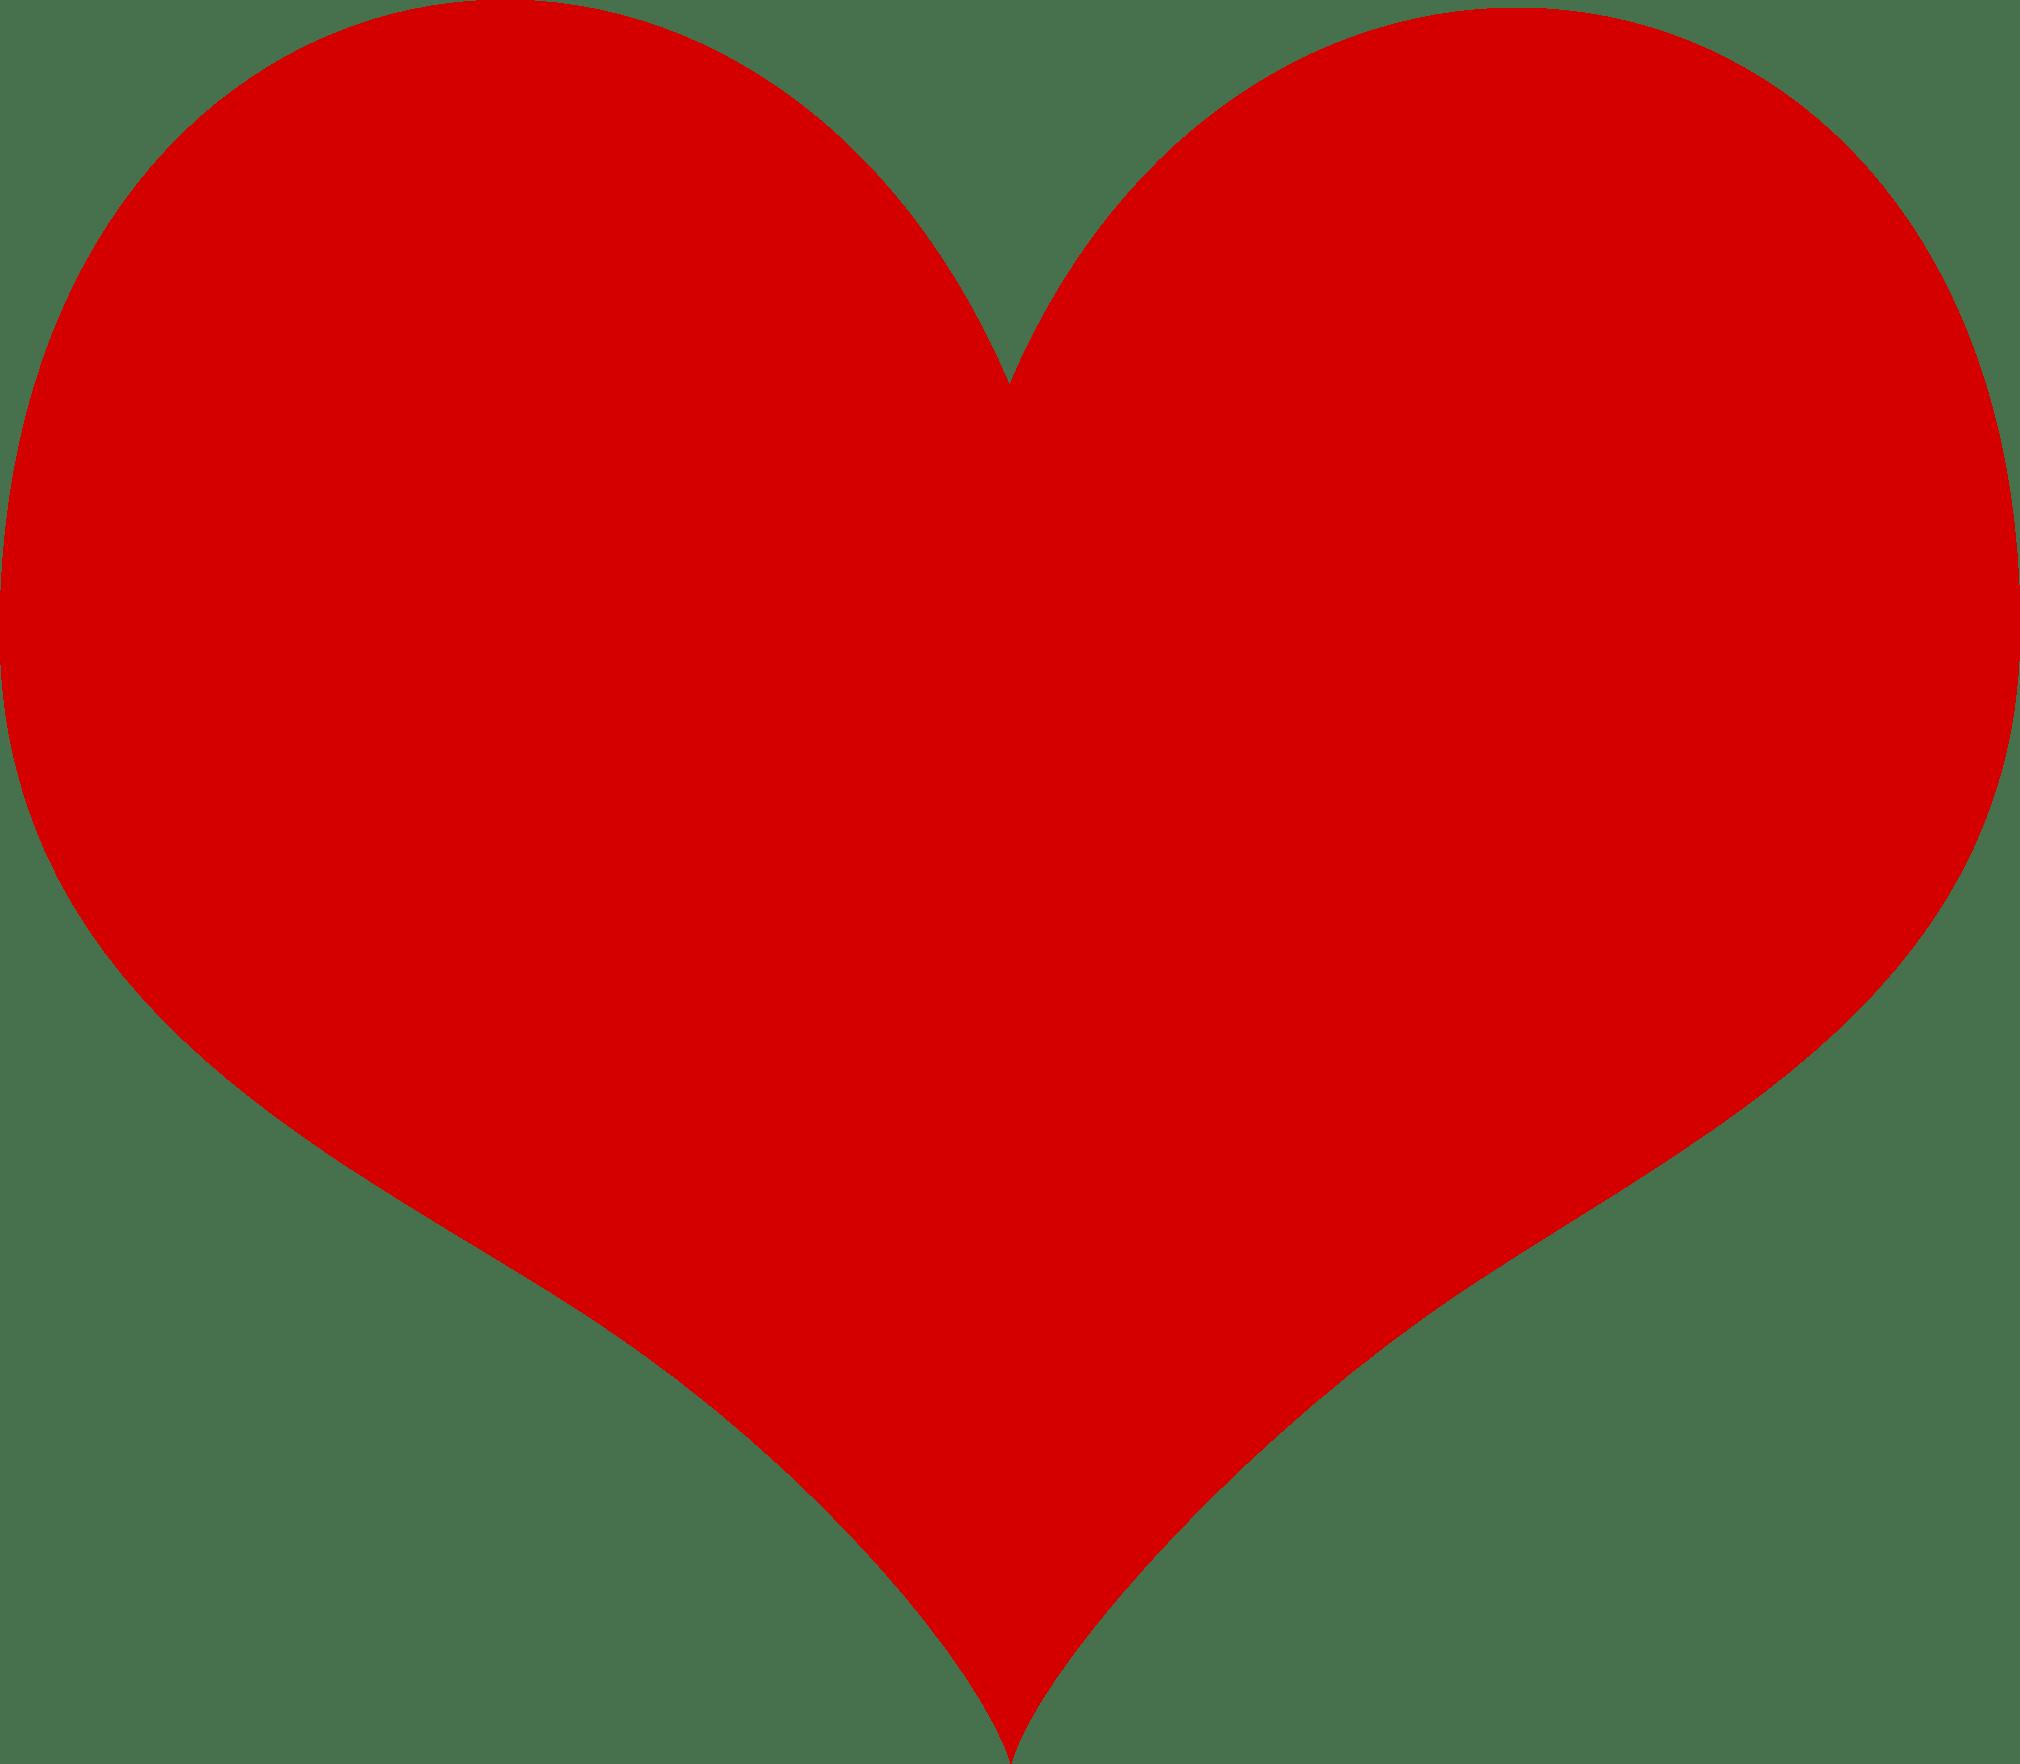 Valentine gram from the. Eraser clipart red